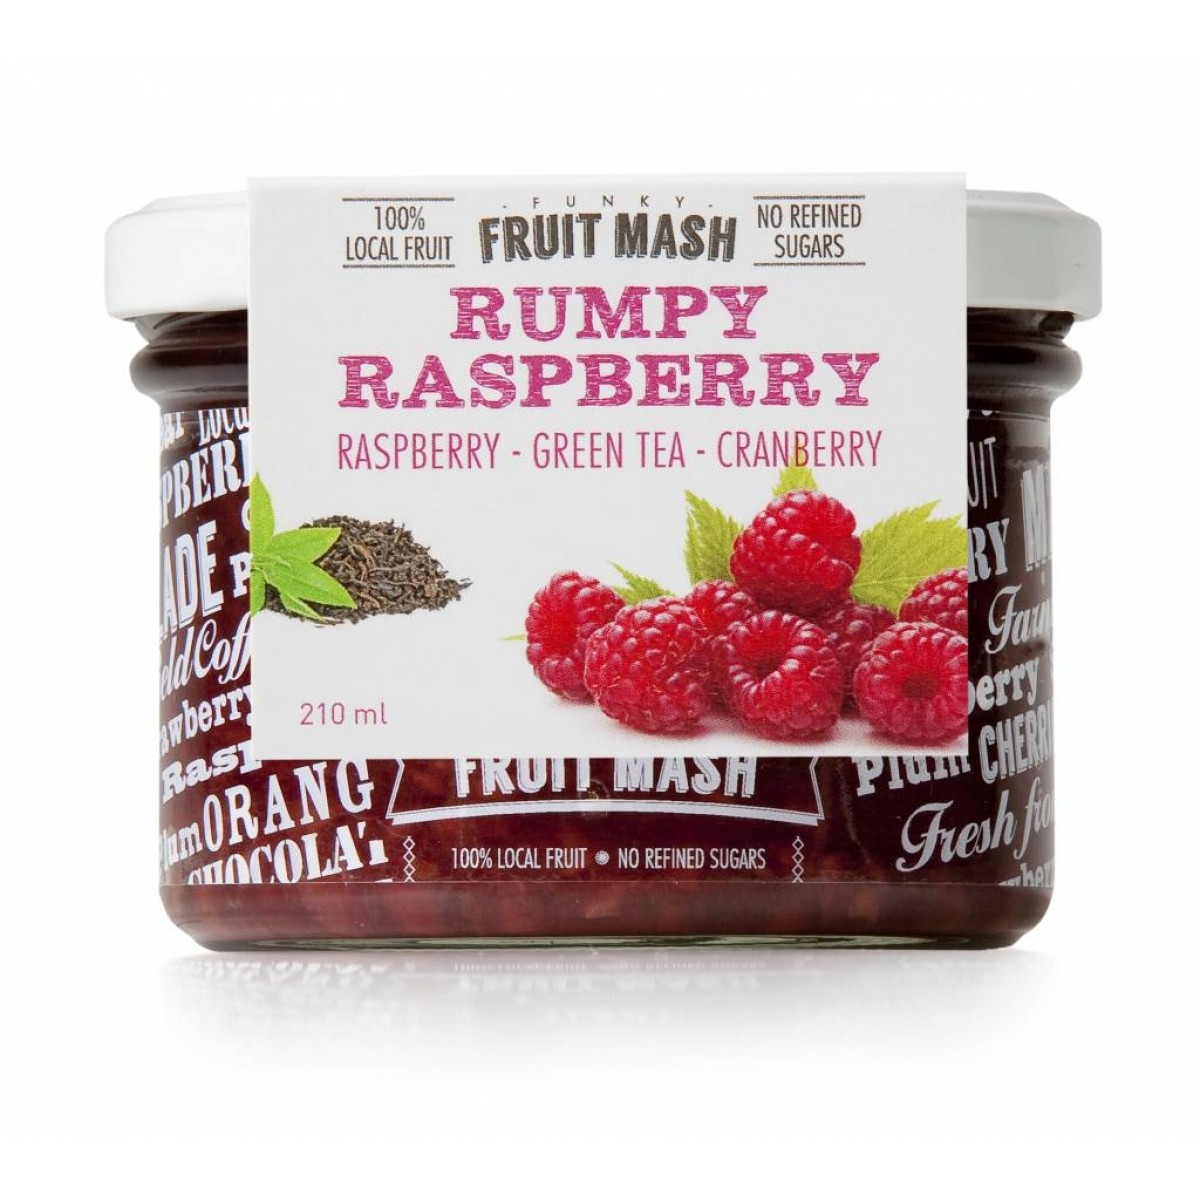 Funky Fruit Mash Rumpy Raspberry